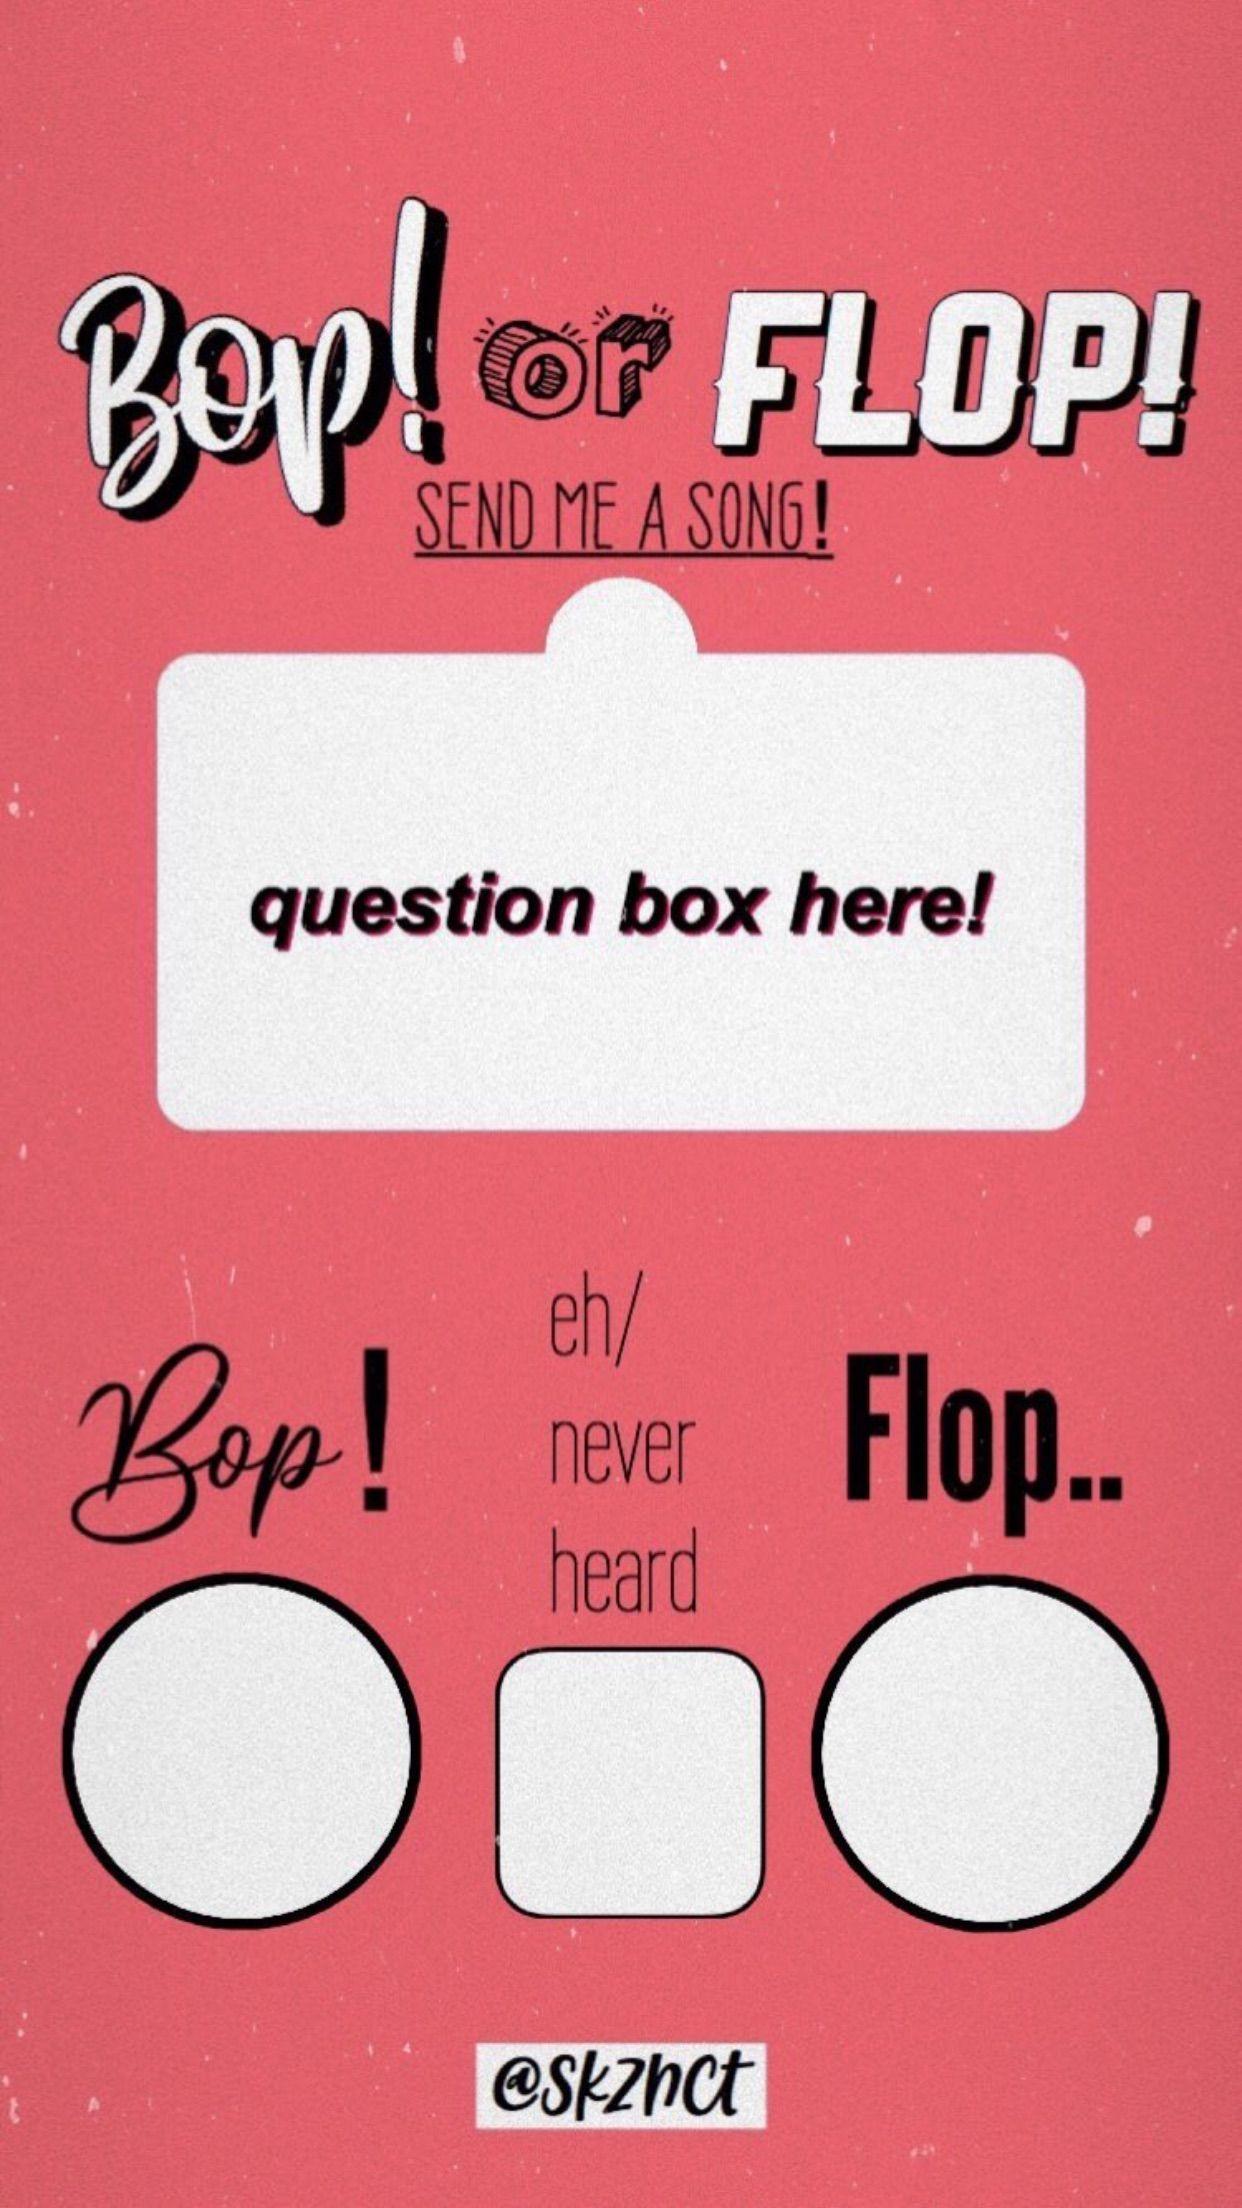 Kpop Instagram Games Kpop Nct Bts Twice Blackpink Kpopgame Wjsn Ioi Got7 Astro Loona Redvelvet Kpopgames Kpop Memes Templates Songs